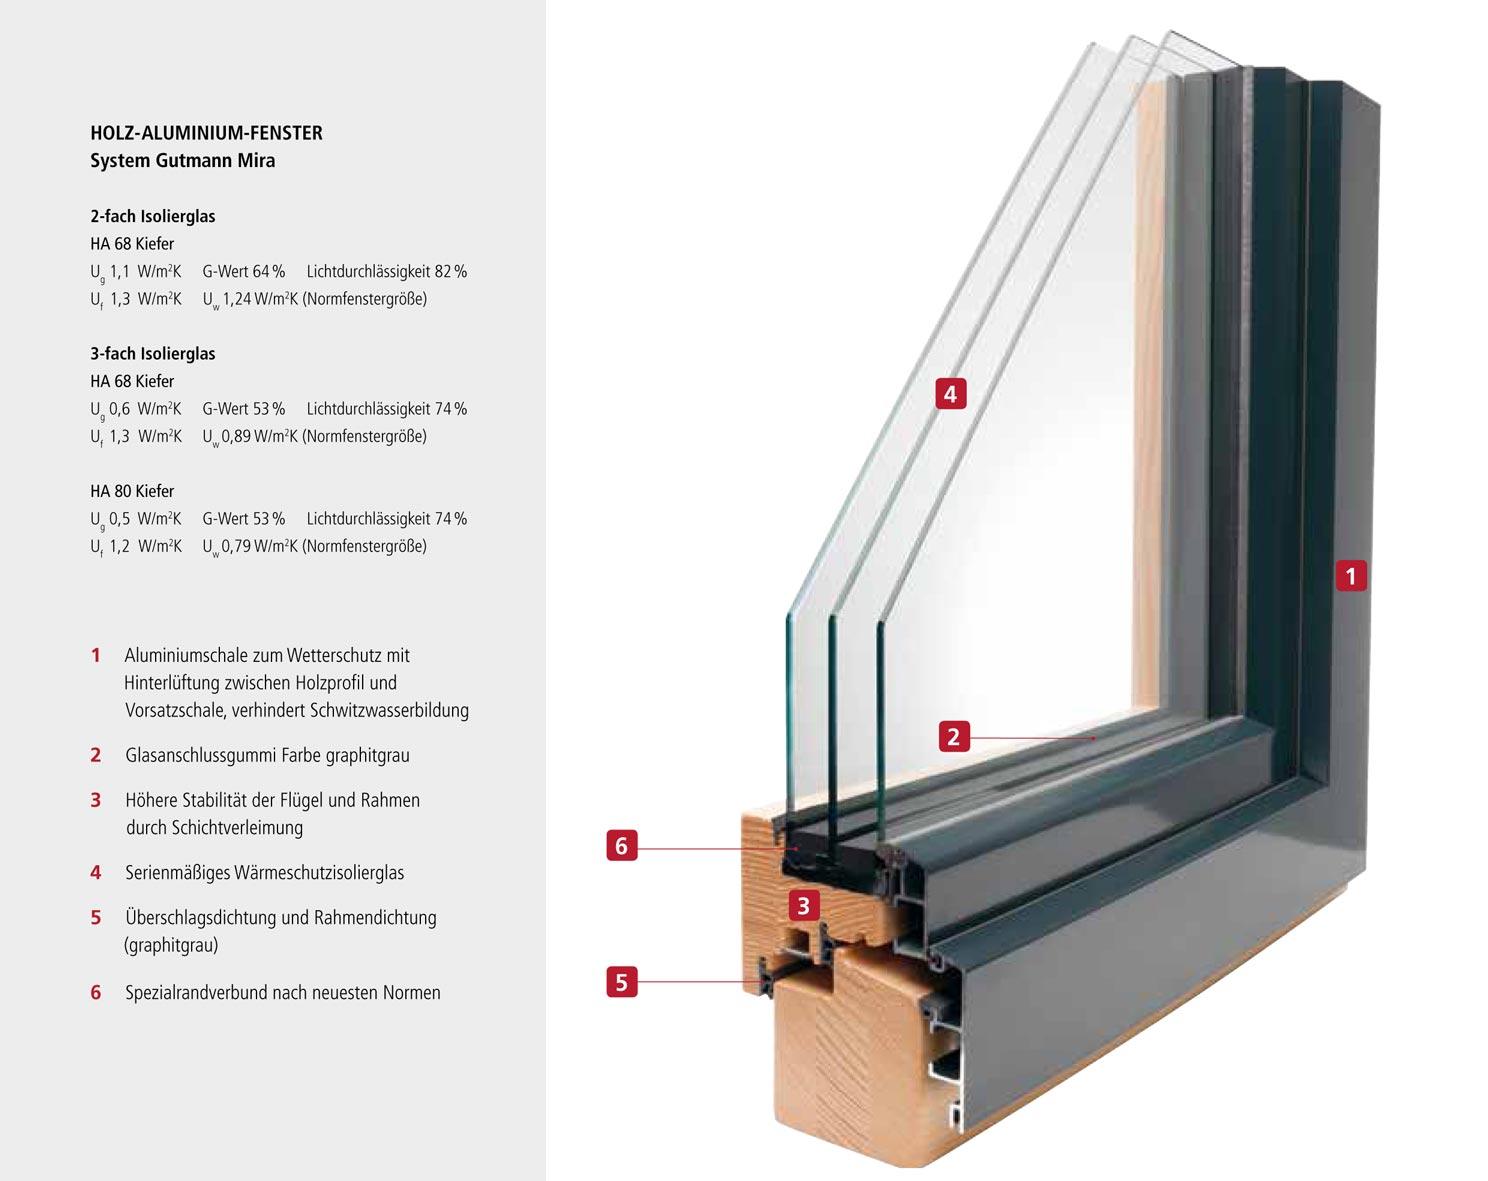 Full Size of Welche Fenster Holz Alu Kunststoff Preisunterschied Kunststofffenster Kostenvergleich Holz Alu Fenster Preisvergleich Kaufen Esstisch Holzplatte Unterschrank Fenster Fenster Holz Alu